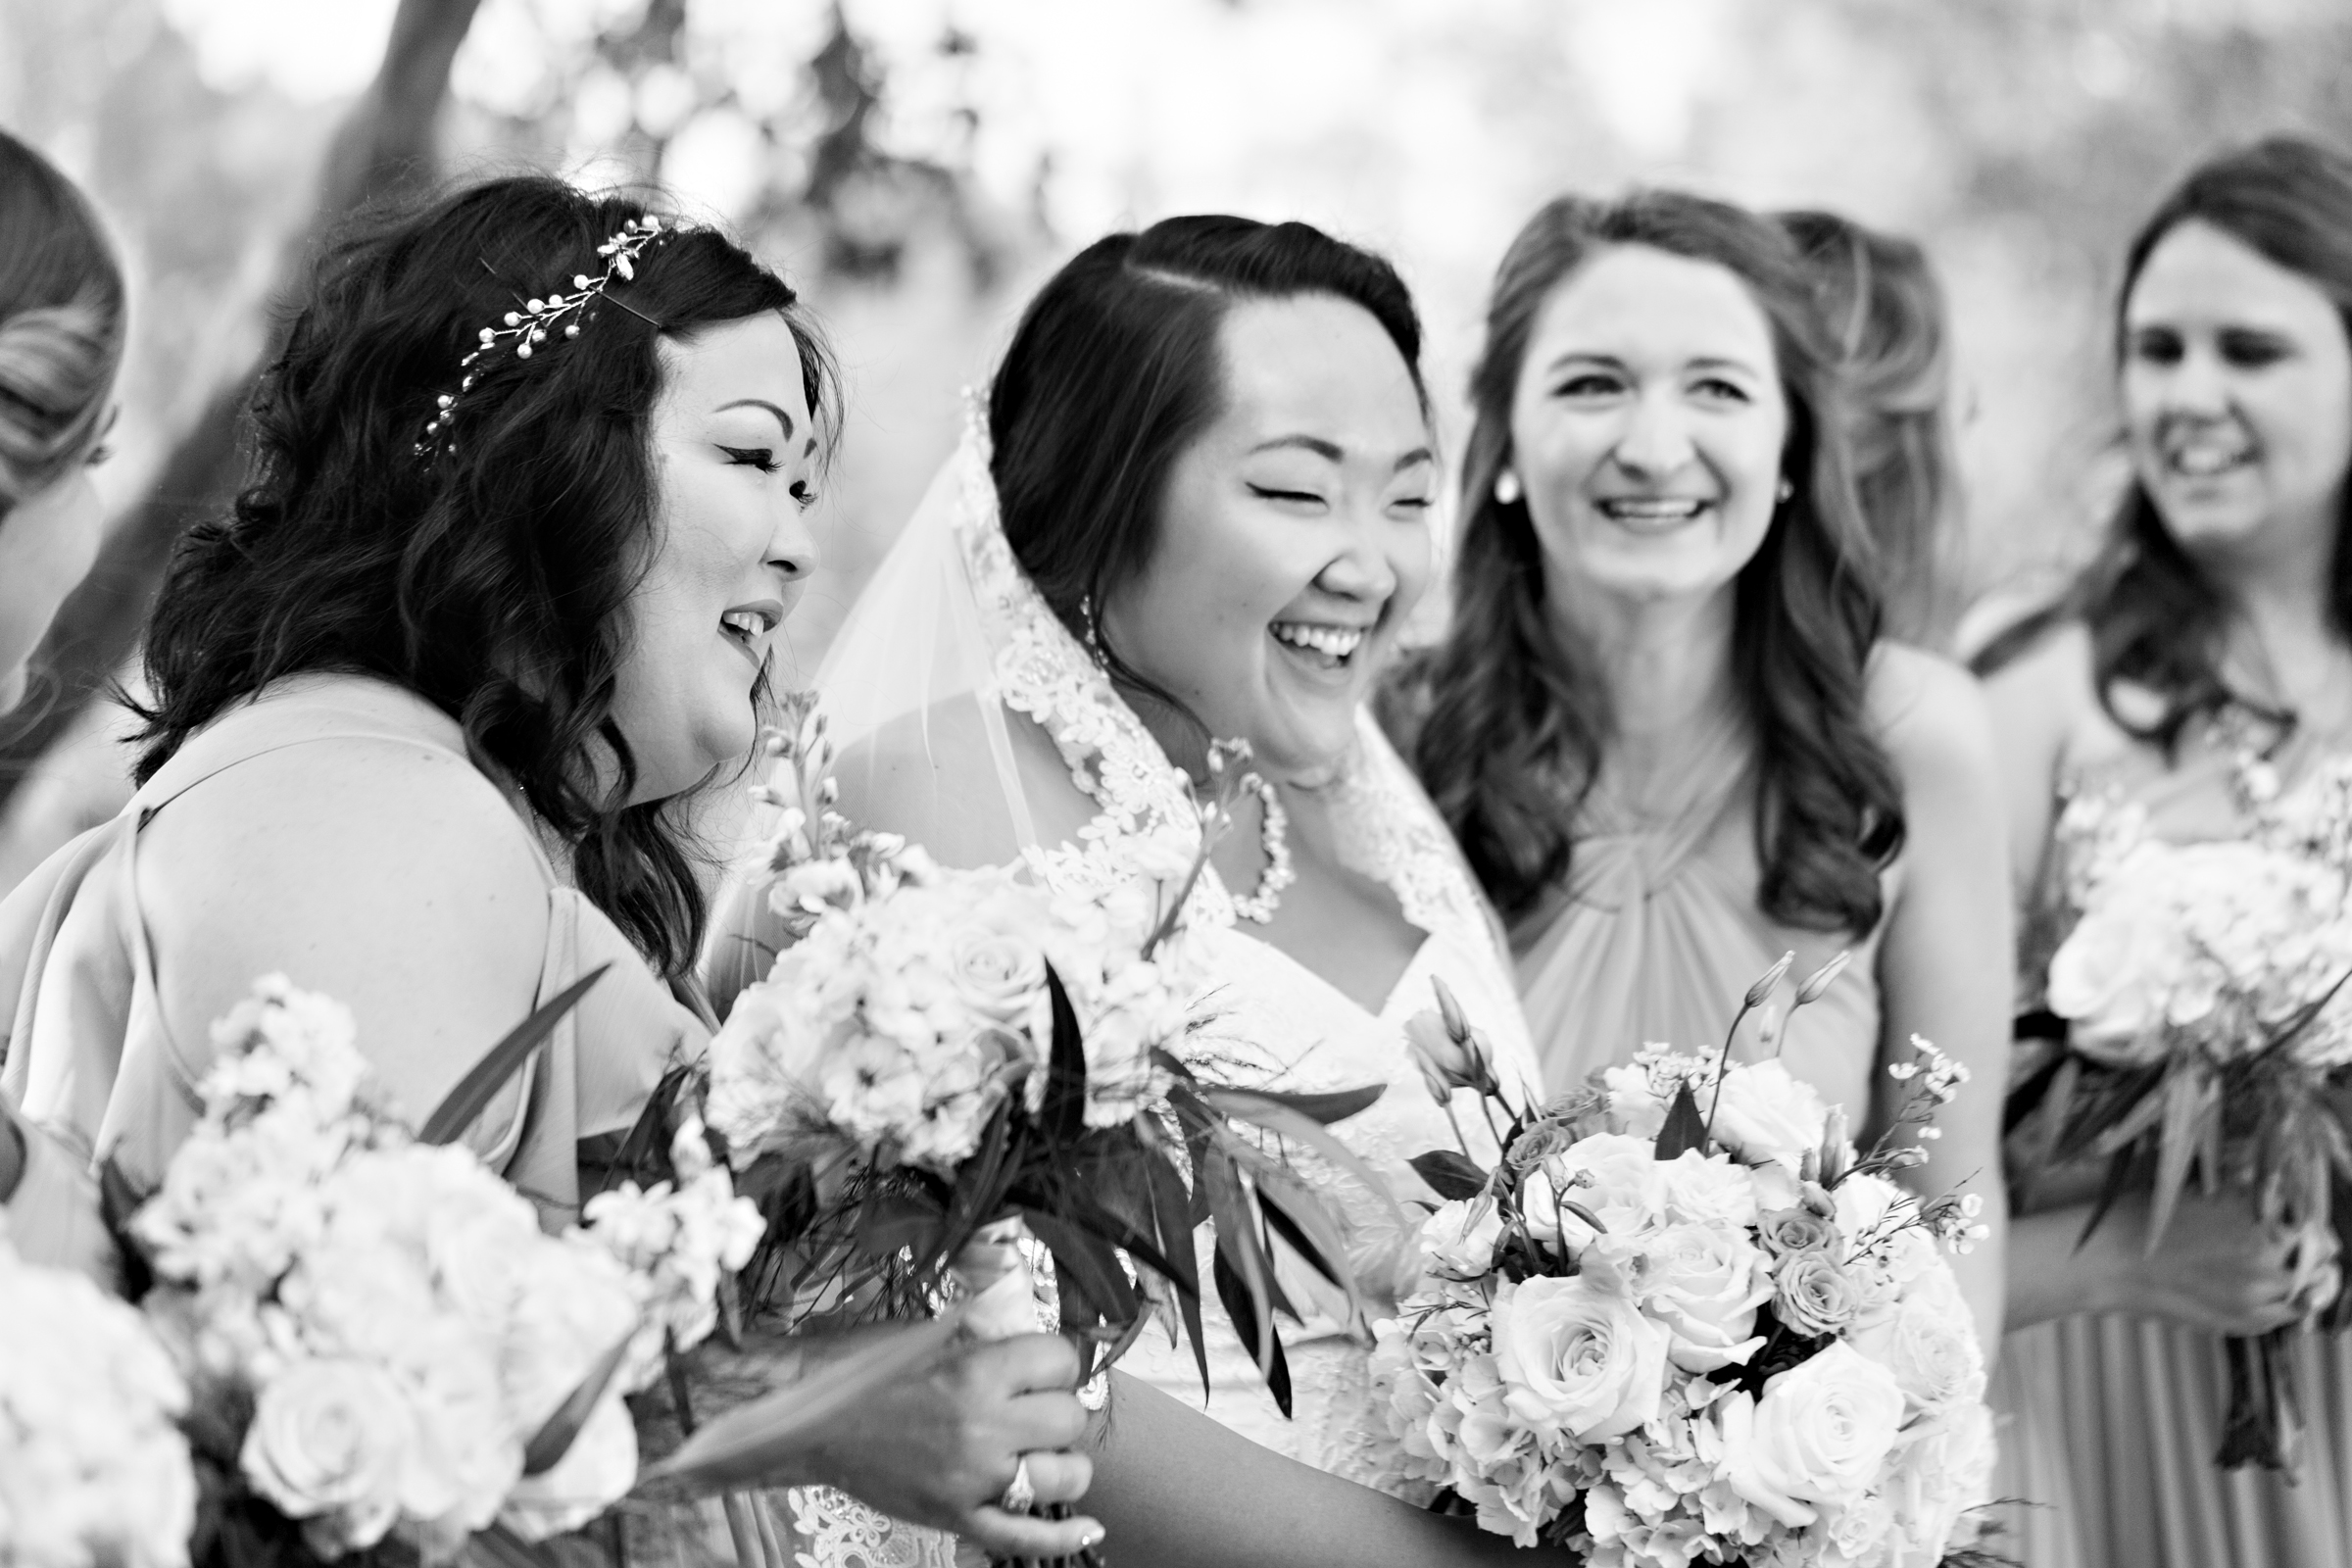 Ni ck-Drollette-Photography-Auburn-Alabama-Weddings-Sylvia-Kevin-110.jpg